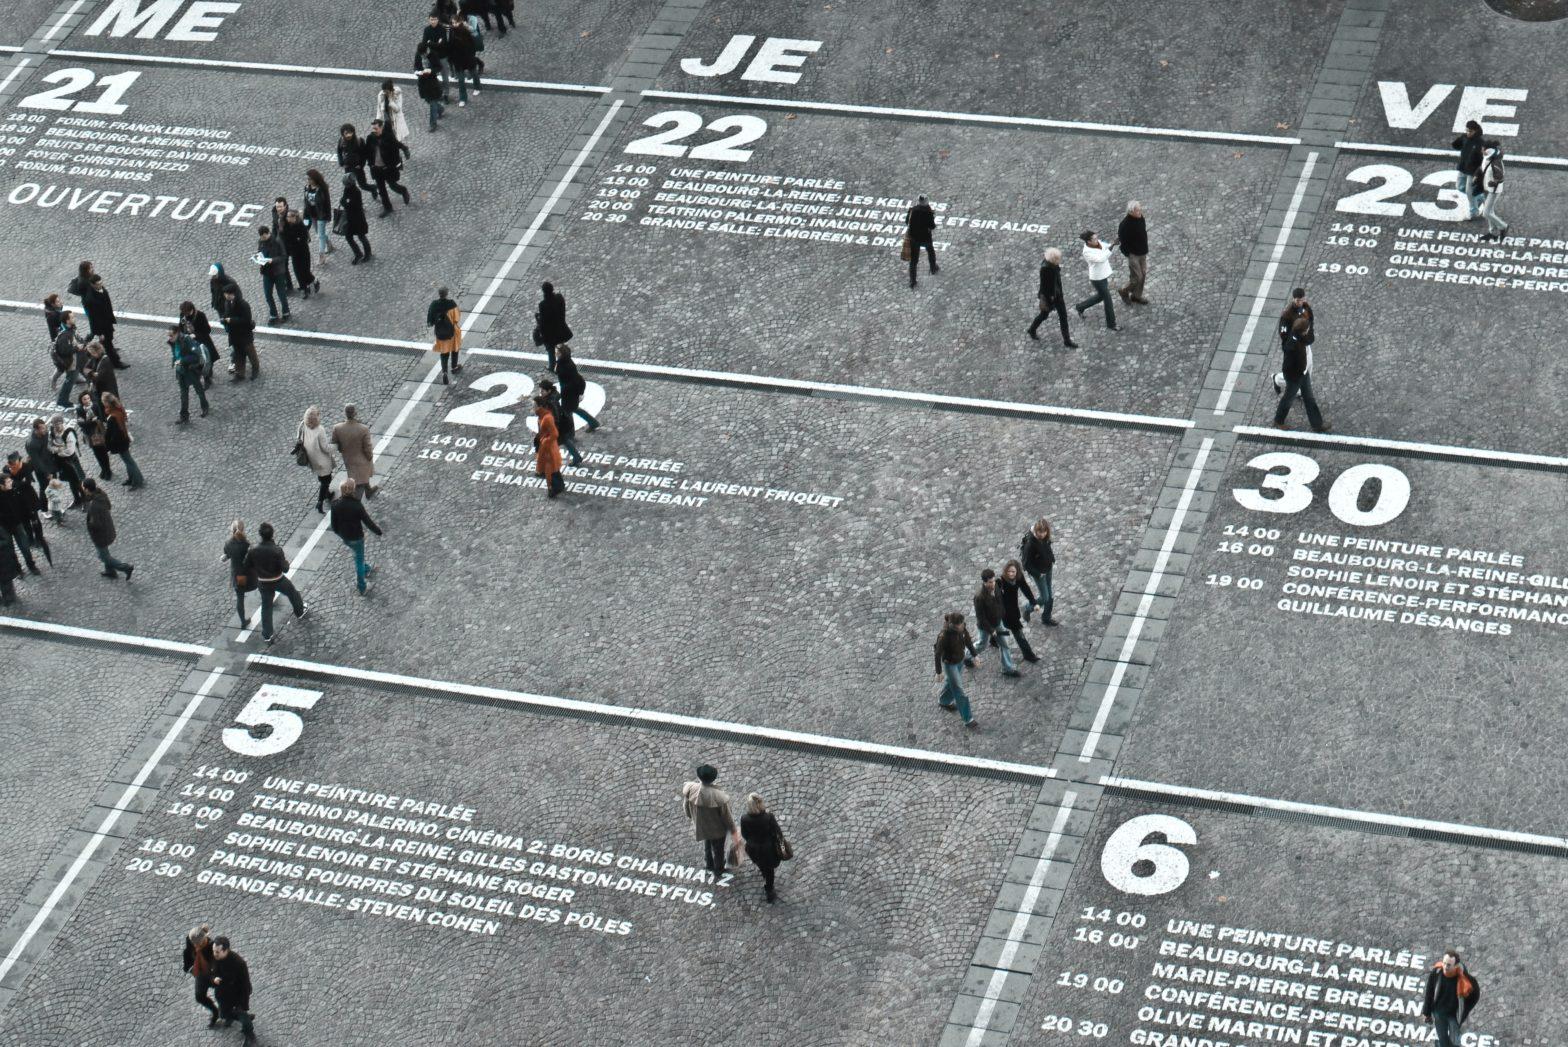 People walking on a calendar scheduler